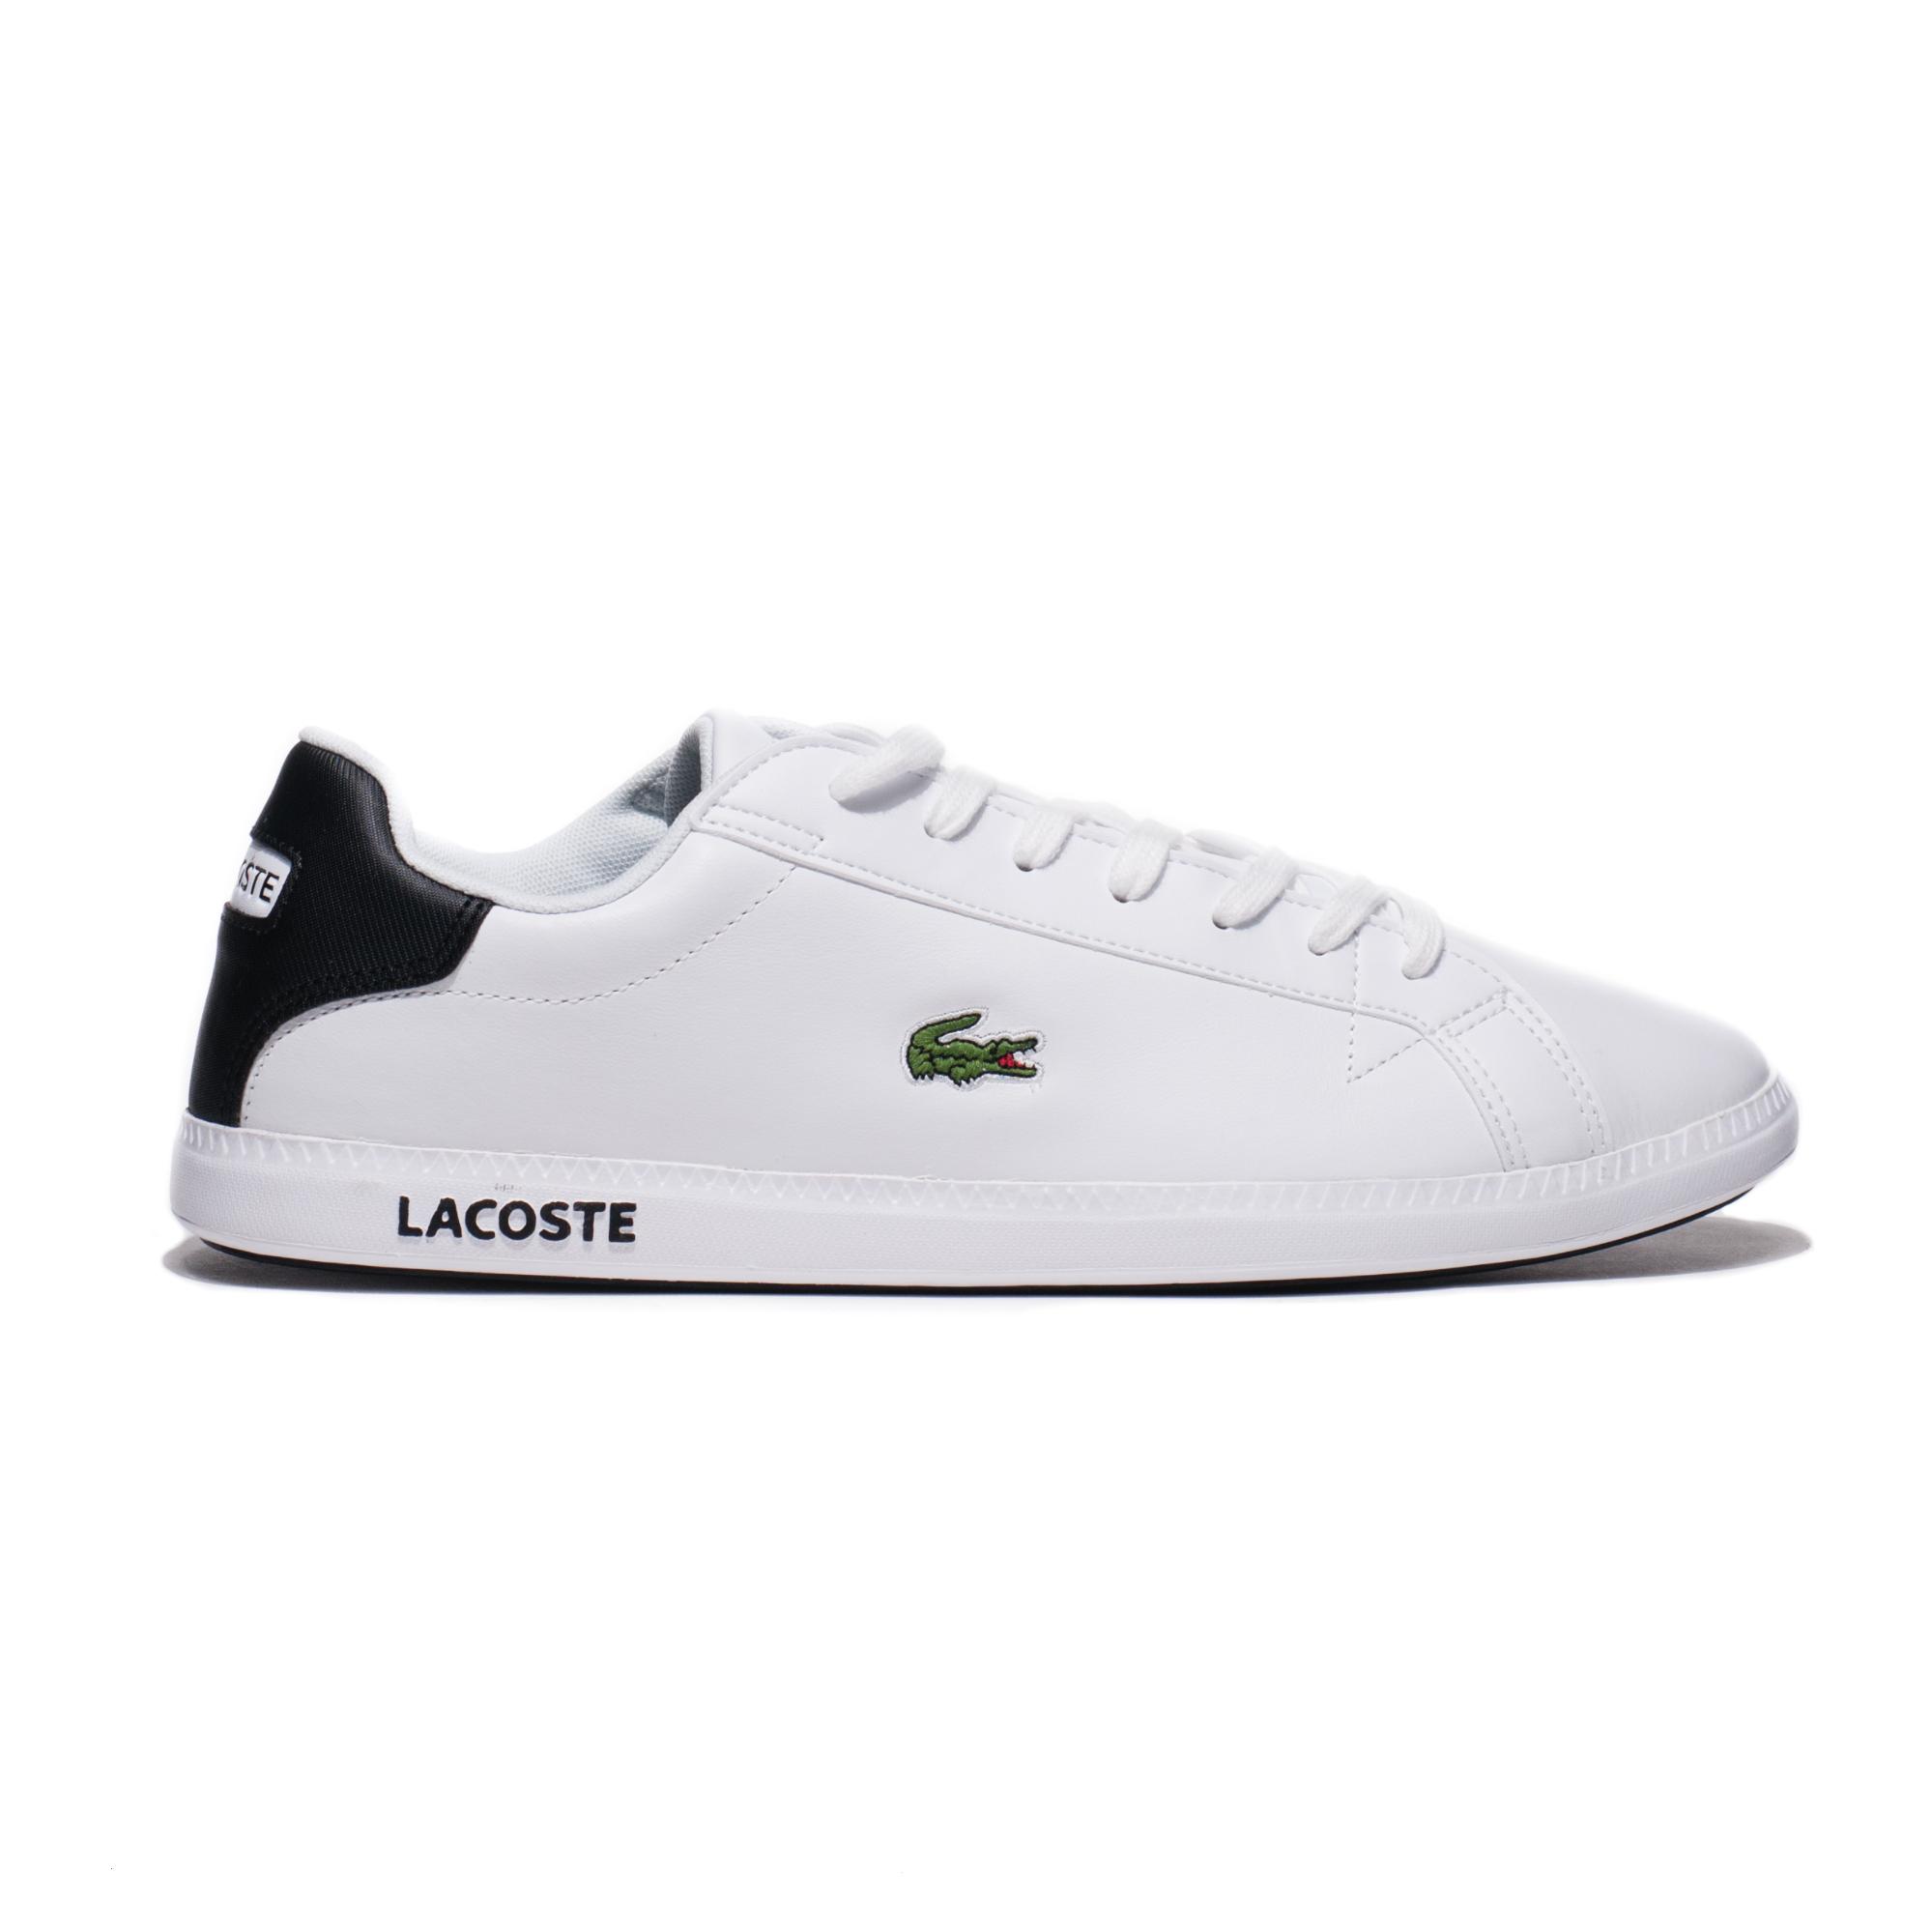 Кросівки чоловічі Lacoste LACOSTE GRADUATE 0120 2 SMA ERKEK BEYAZ - SIYAH SPOR AYAKKABI